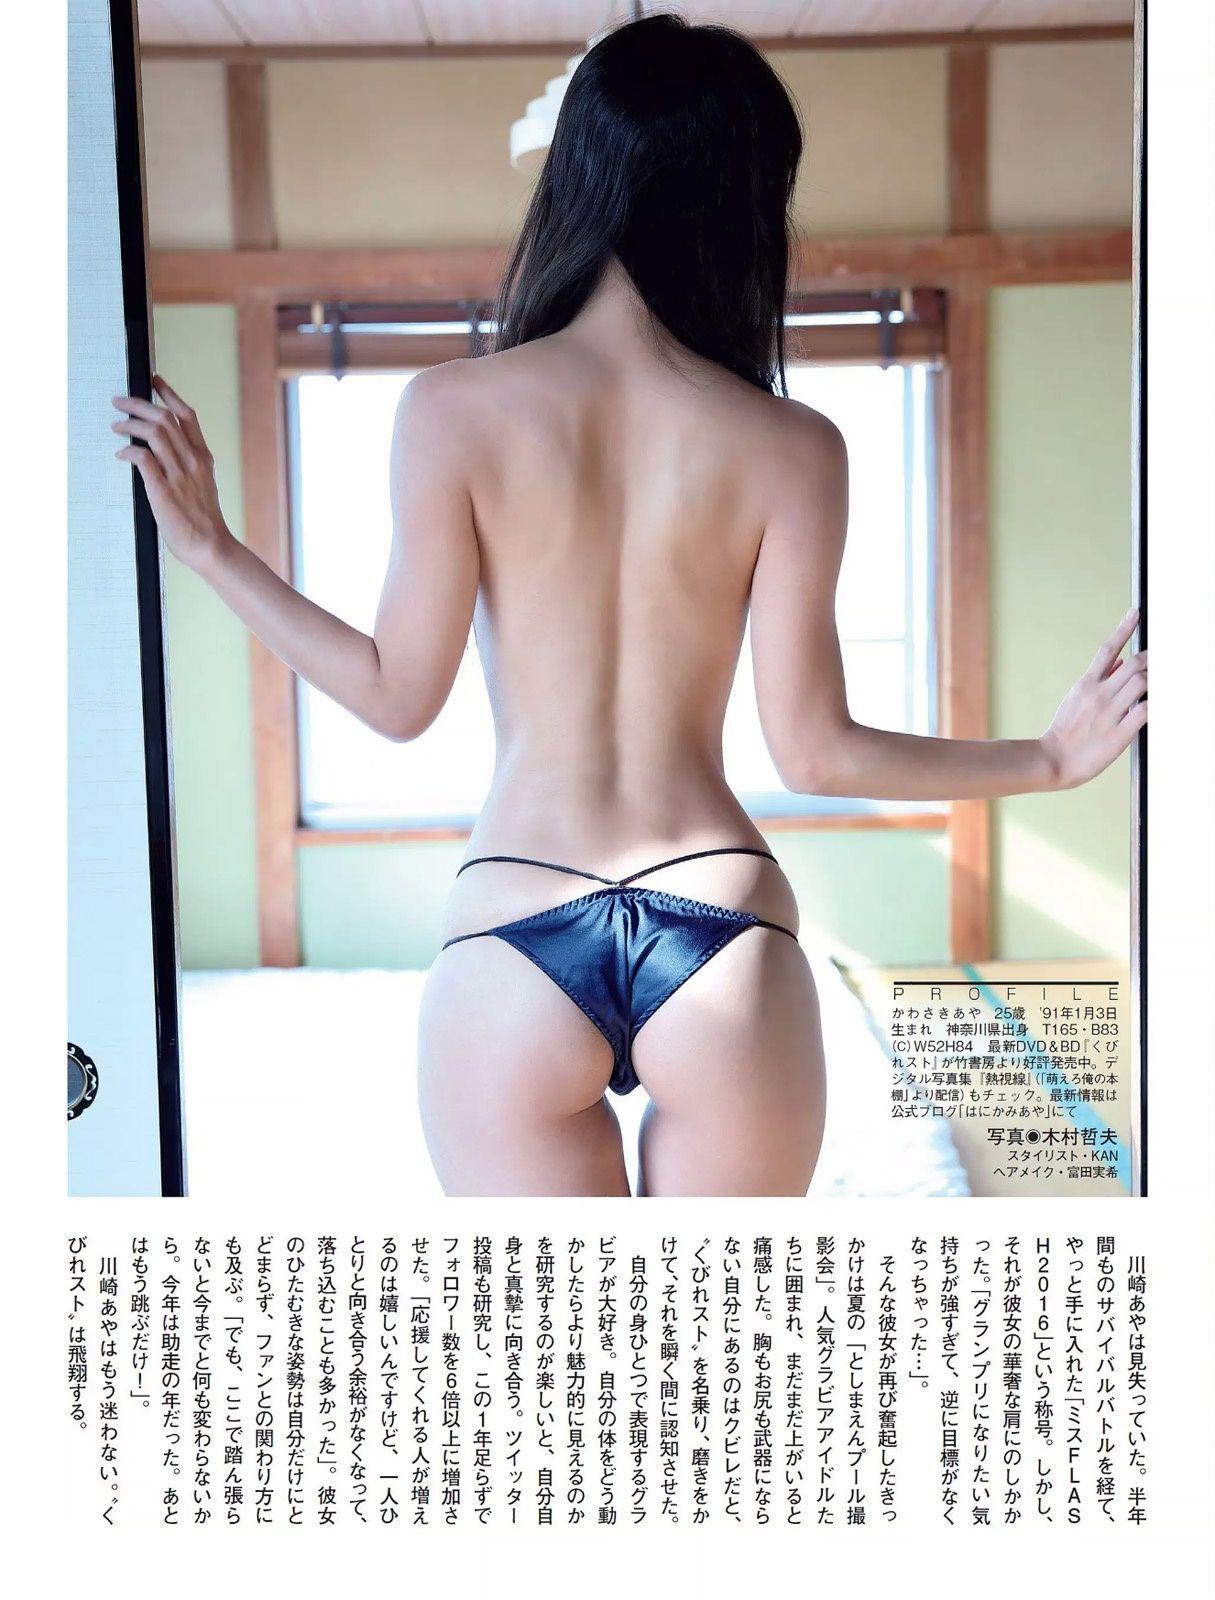 MET ART aya Aya Kawasaki 川崎あや, FLASH 電子版 2017.01.03 No.1405 - Japan